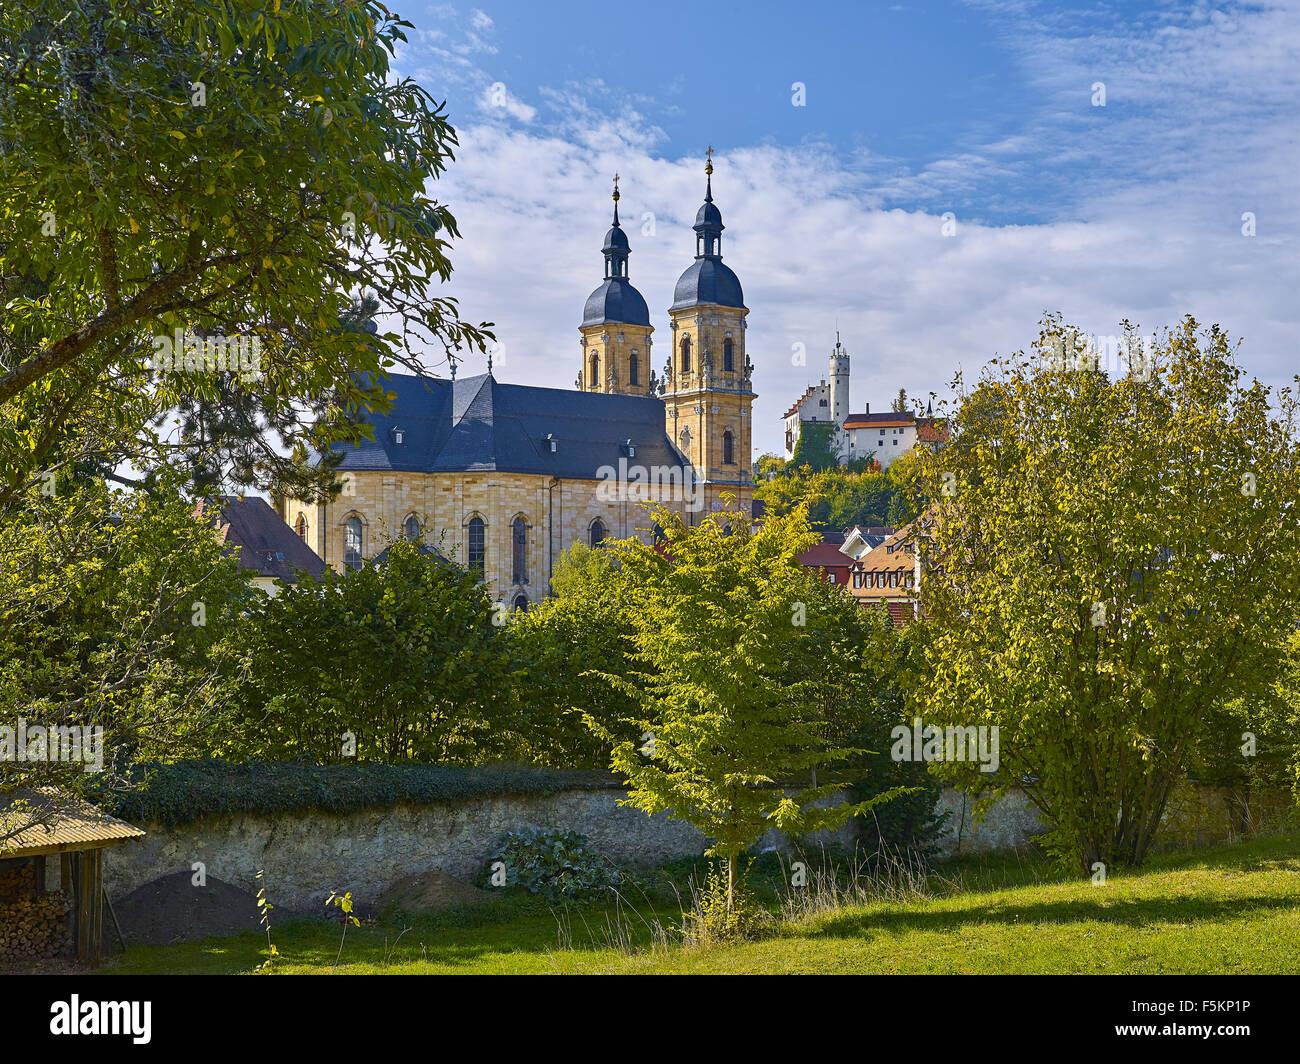 Pilgrimage Church with castle, Gößweinstein, Bavaria, Germany Stock Photo